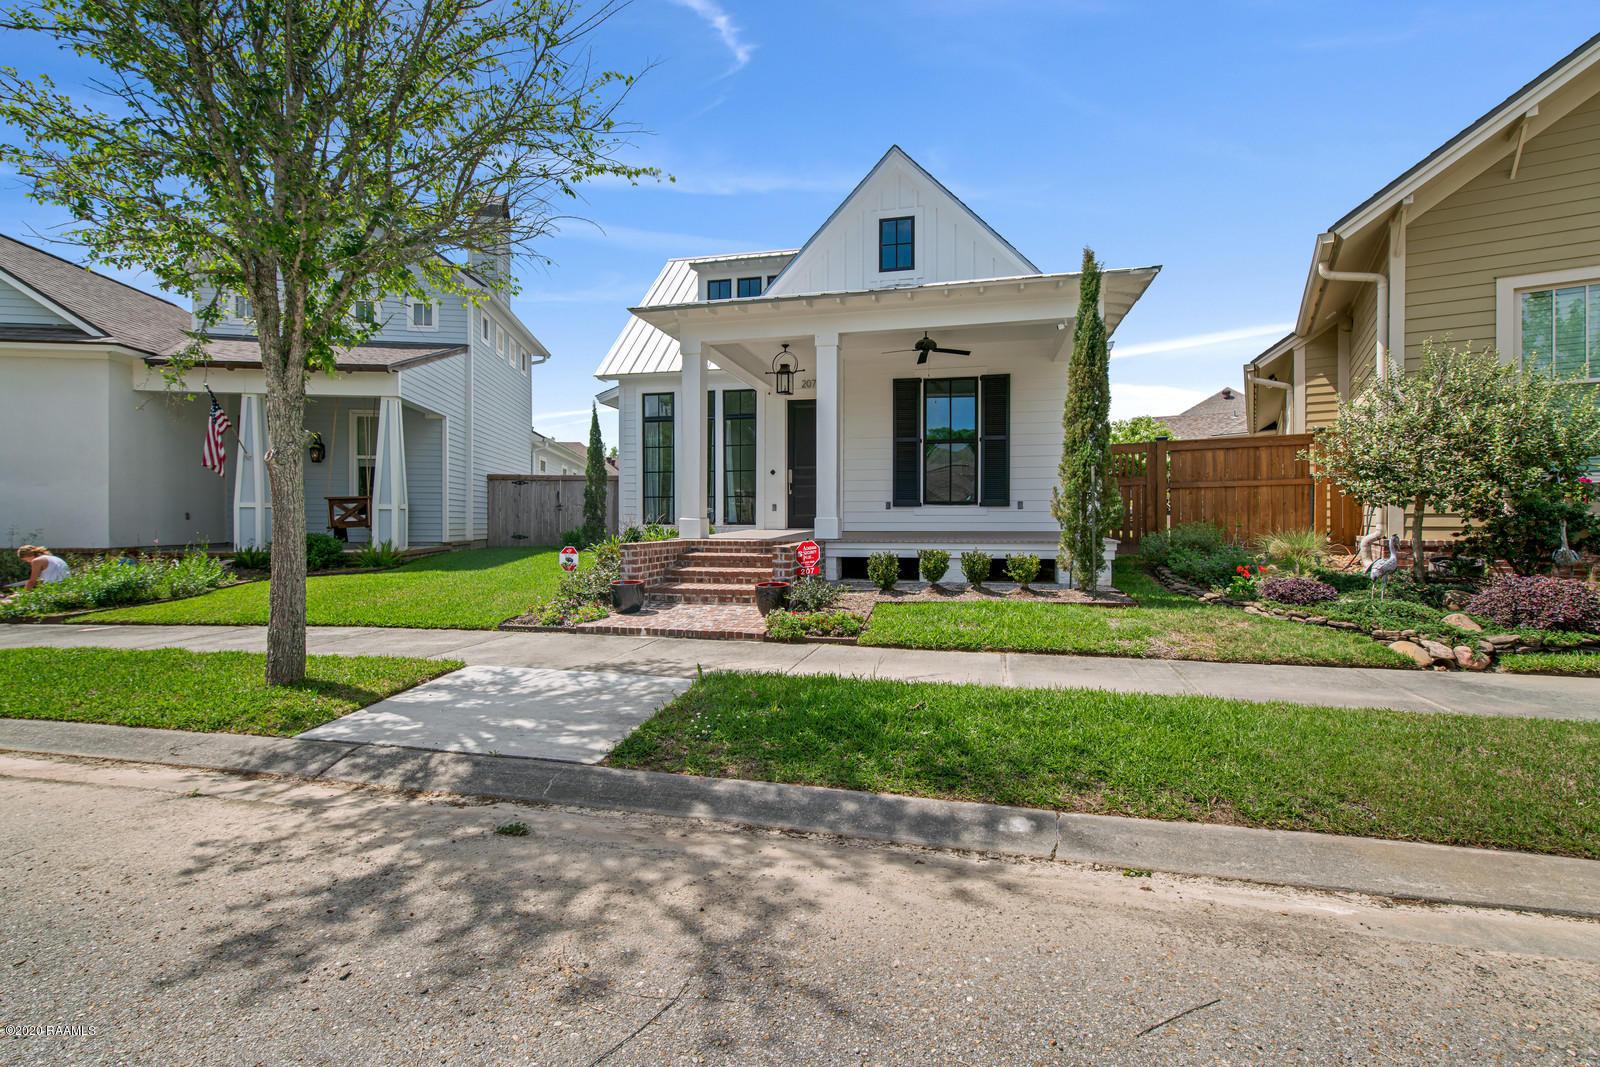 207 Lambton Drive, Lafayette, LA 70508 Photo #1